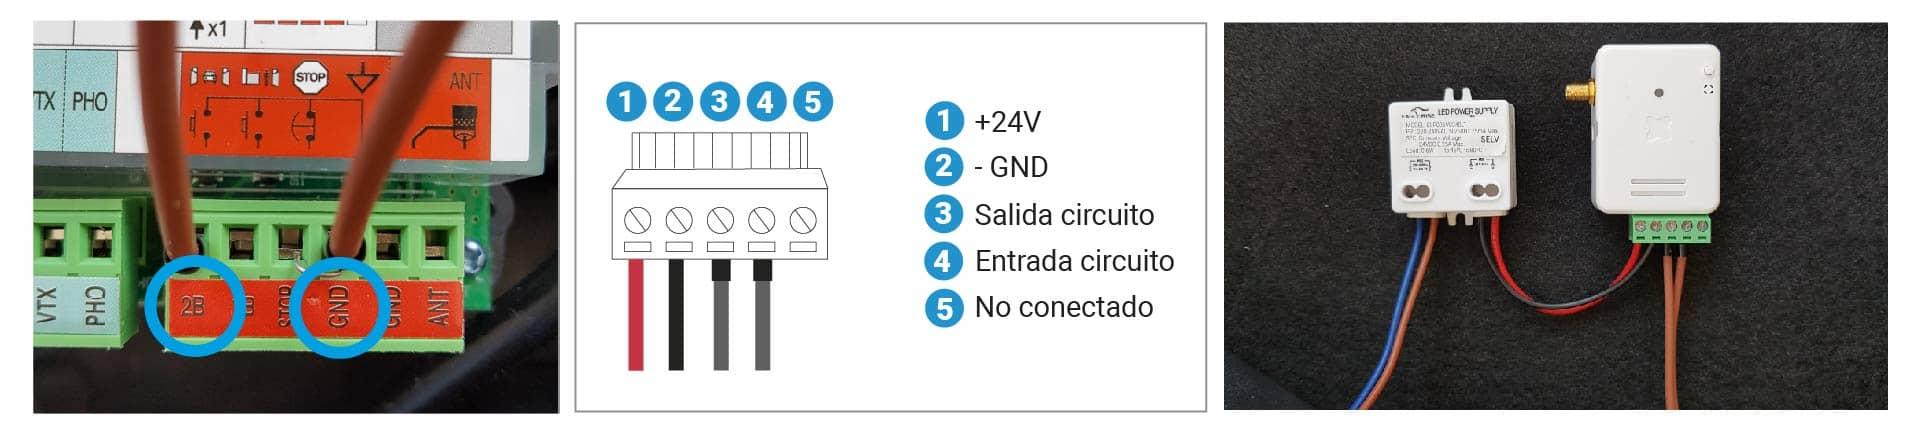 Conexión con la centralita